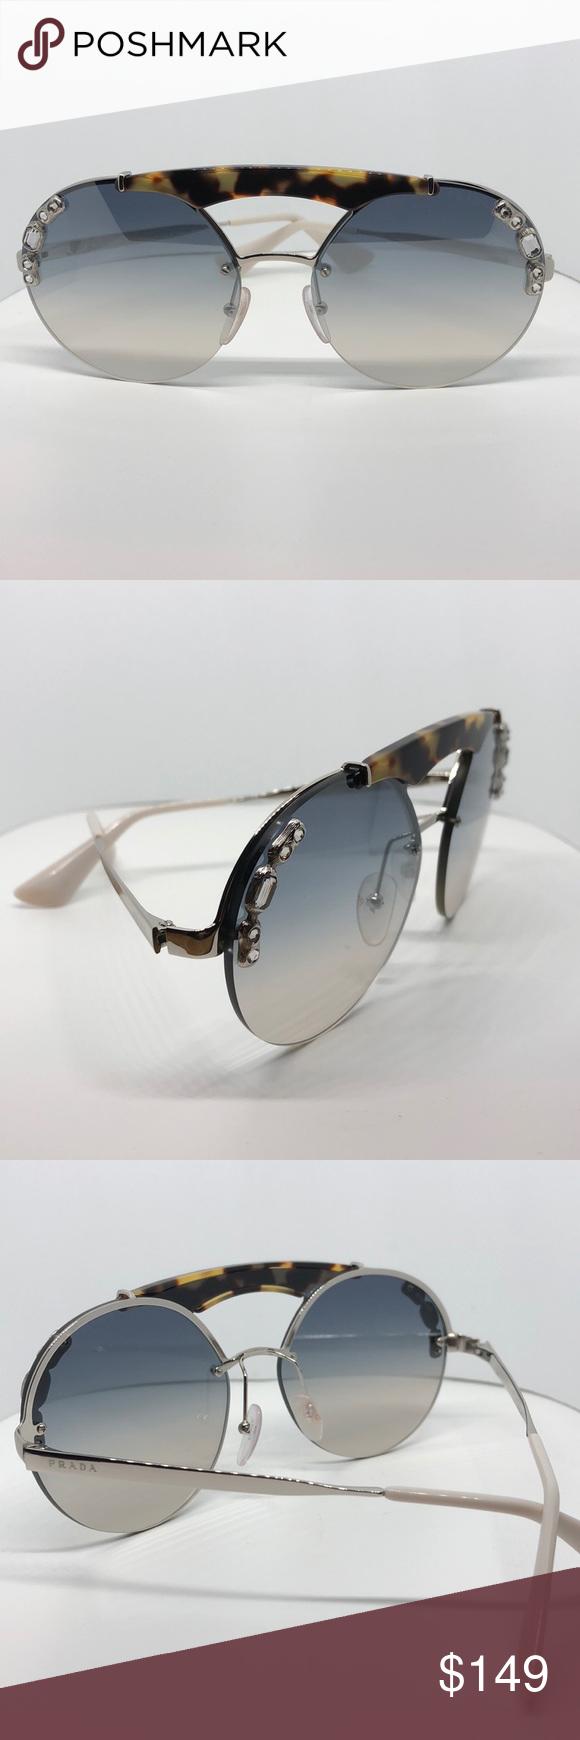 bcbf57b8ad6b Women s Preloved Prada Sunglasses Sunglasses New Prada Sunglasses Women SPR  53U Brown 23C-5R0 SPR53U